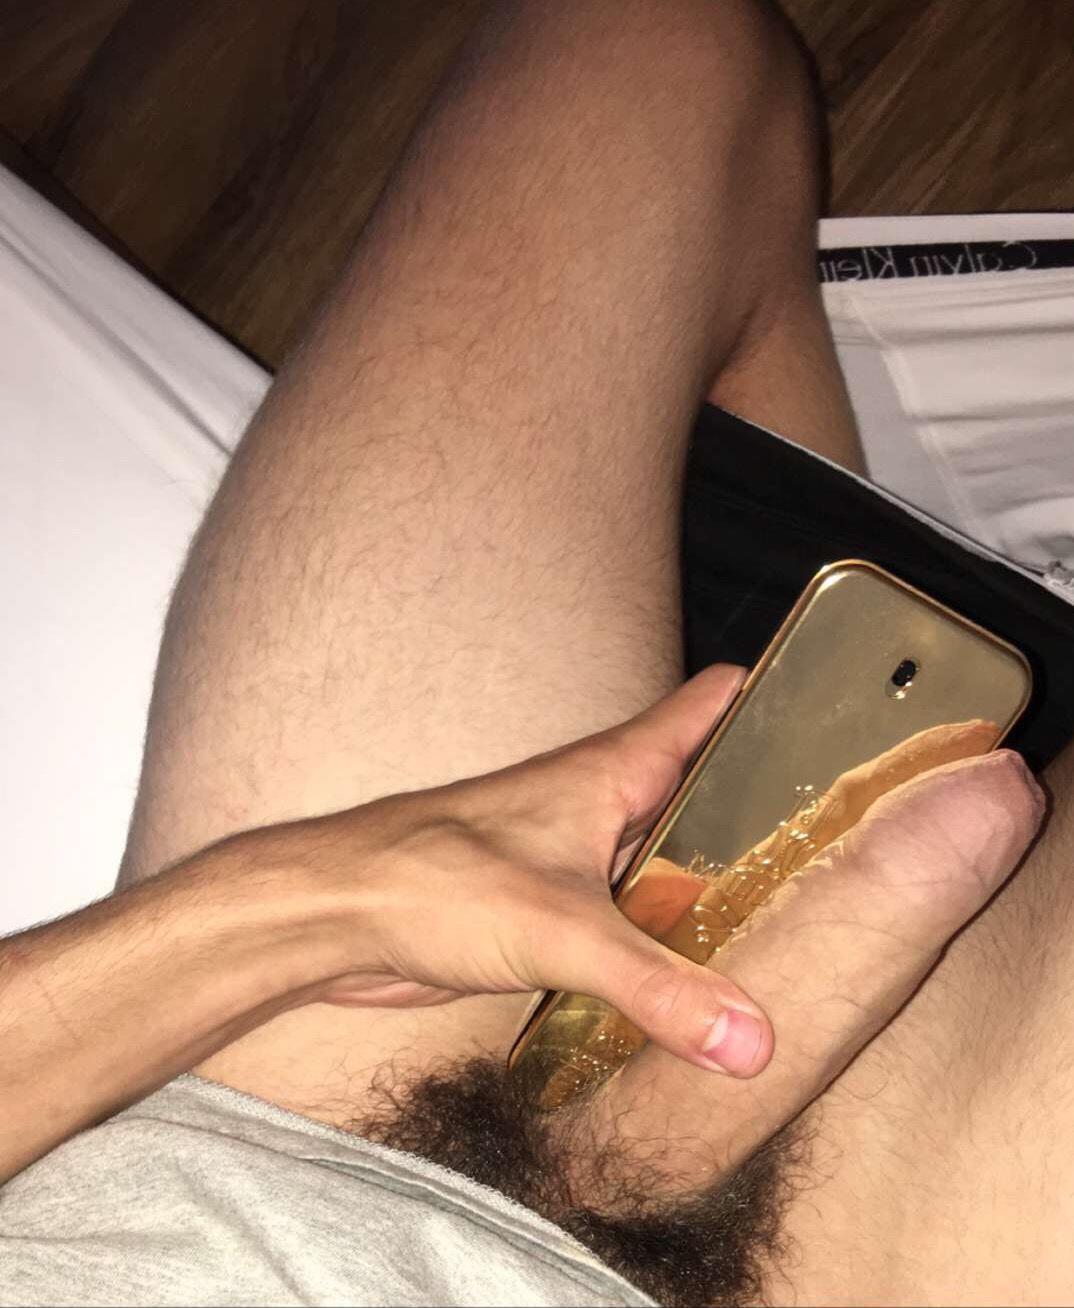 naked phone pics men